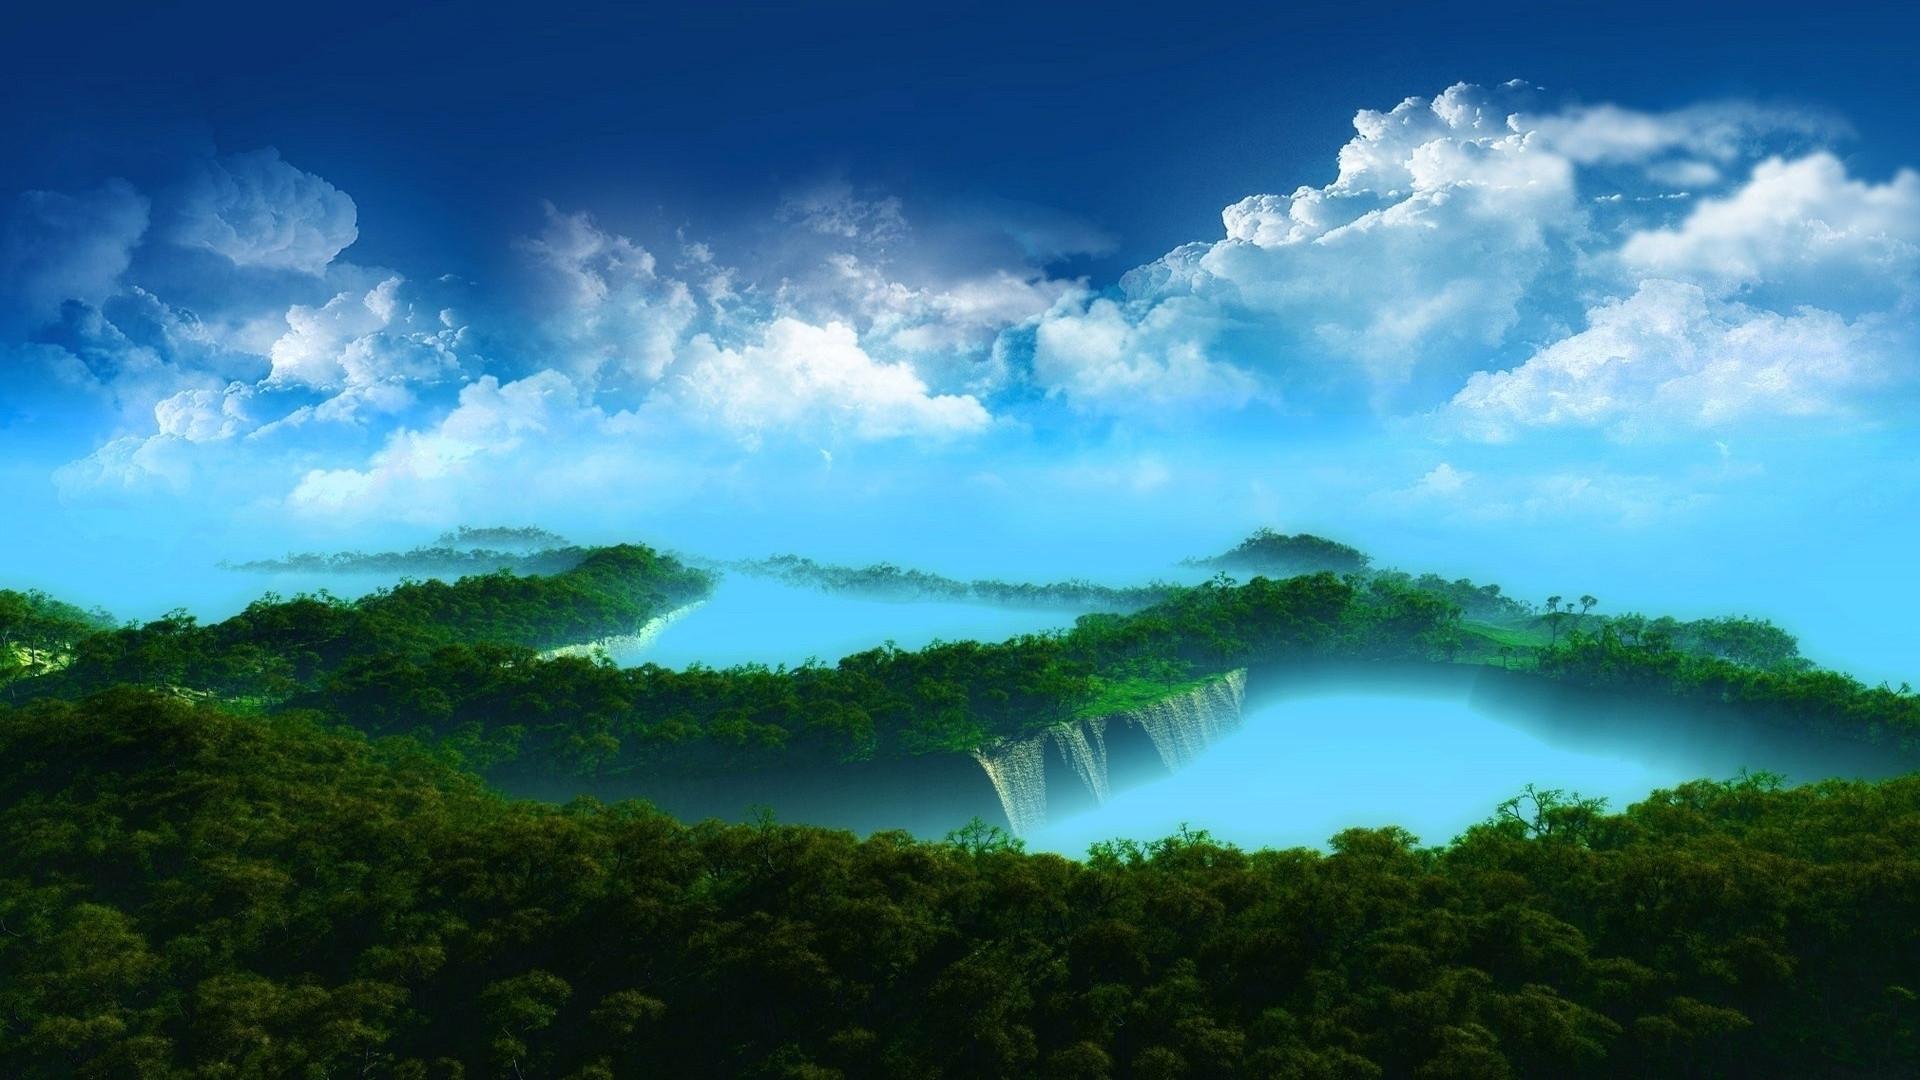 Digital Landscape Wallpaper Sf Wallpaper